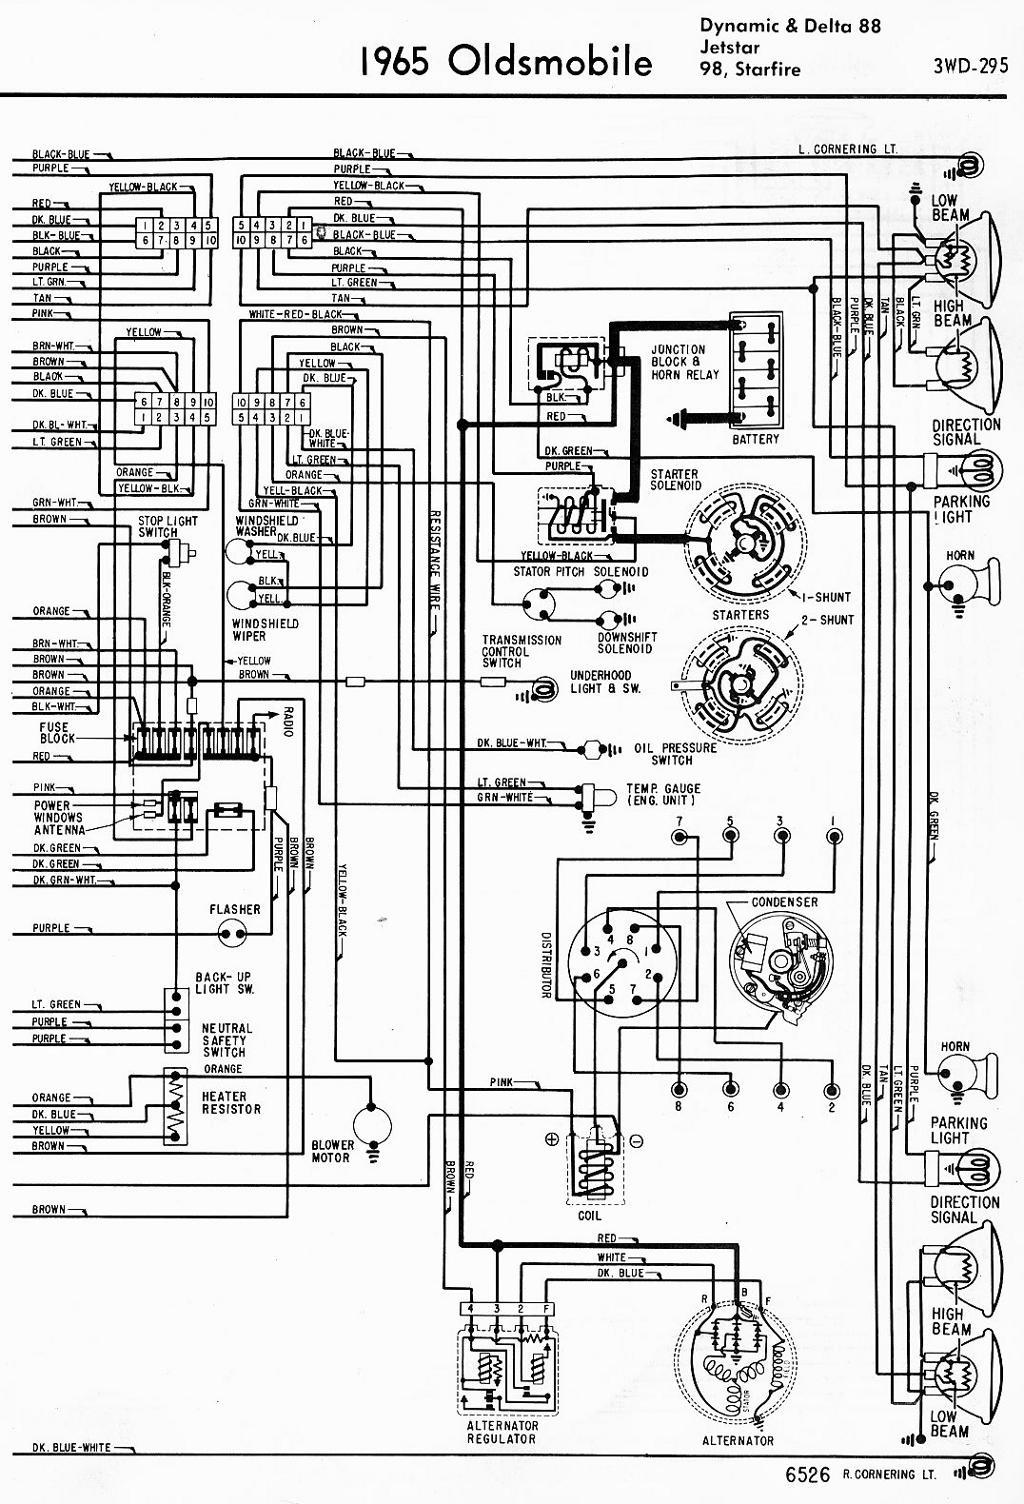 medium resolution of nissan tiida air con wiring diagram wiring diagram third level nissan tiida air con wiring diagram